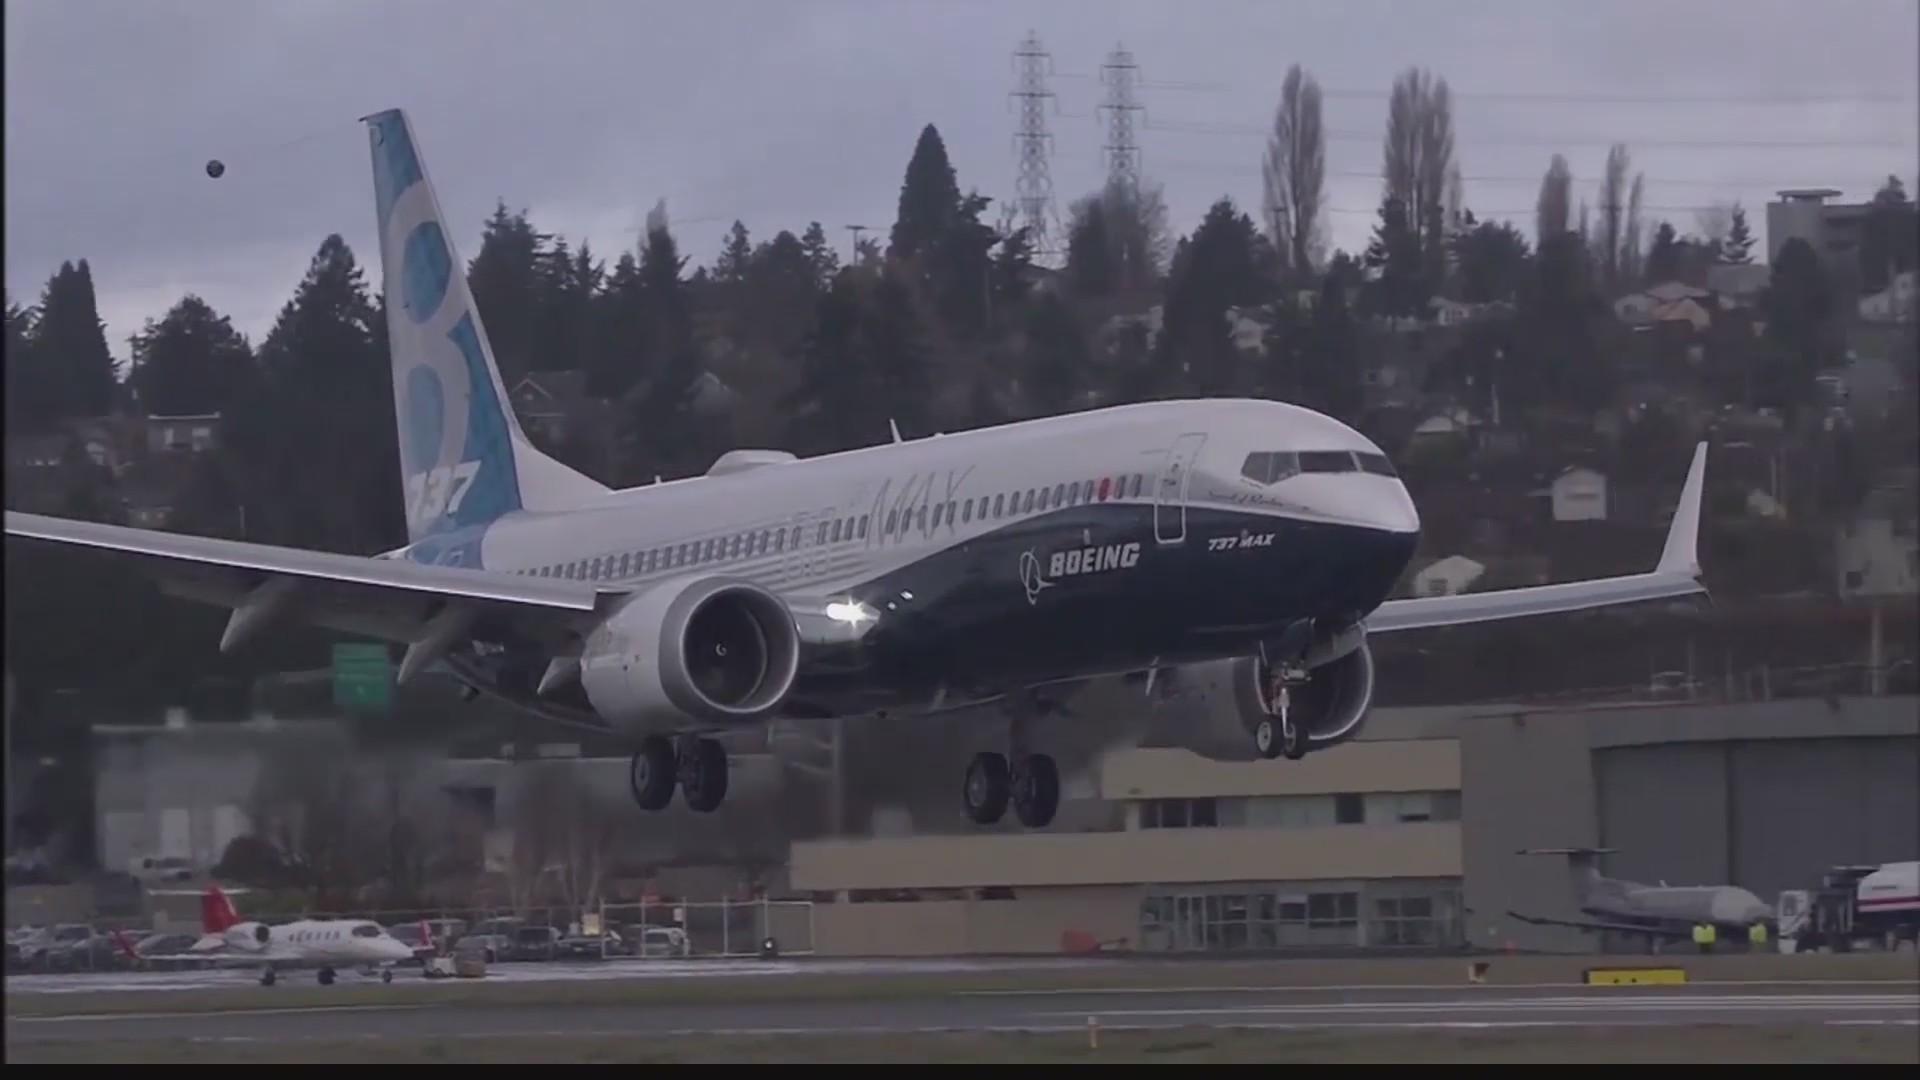 Boeing 737 Max FAA probe Noon 3.18.19